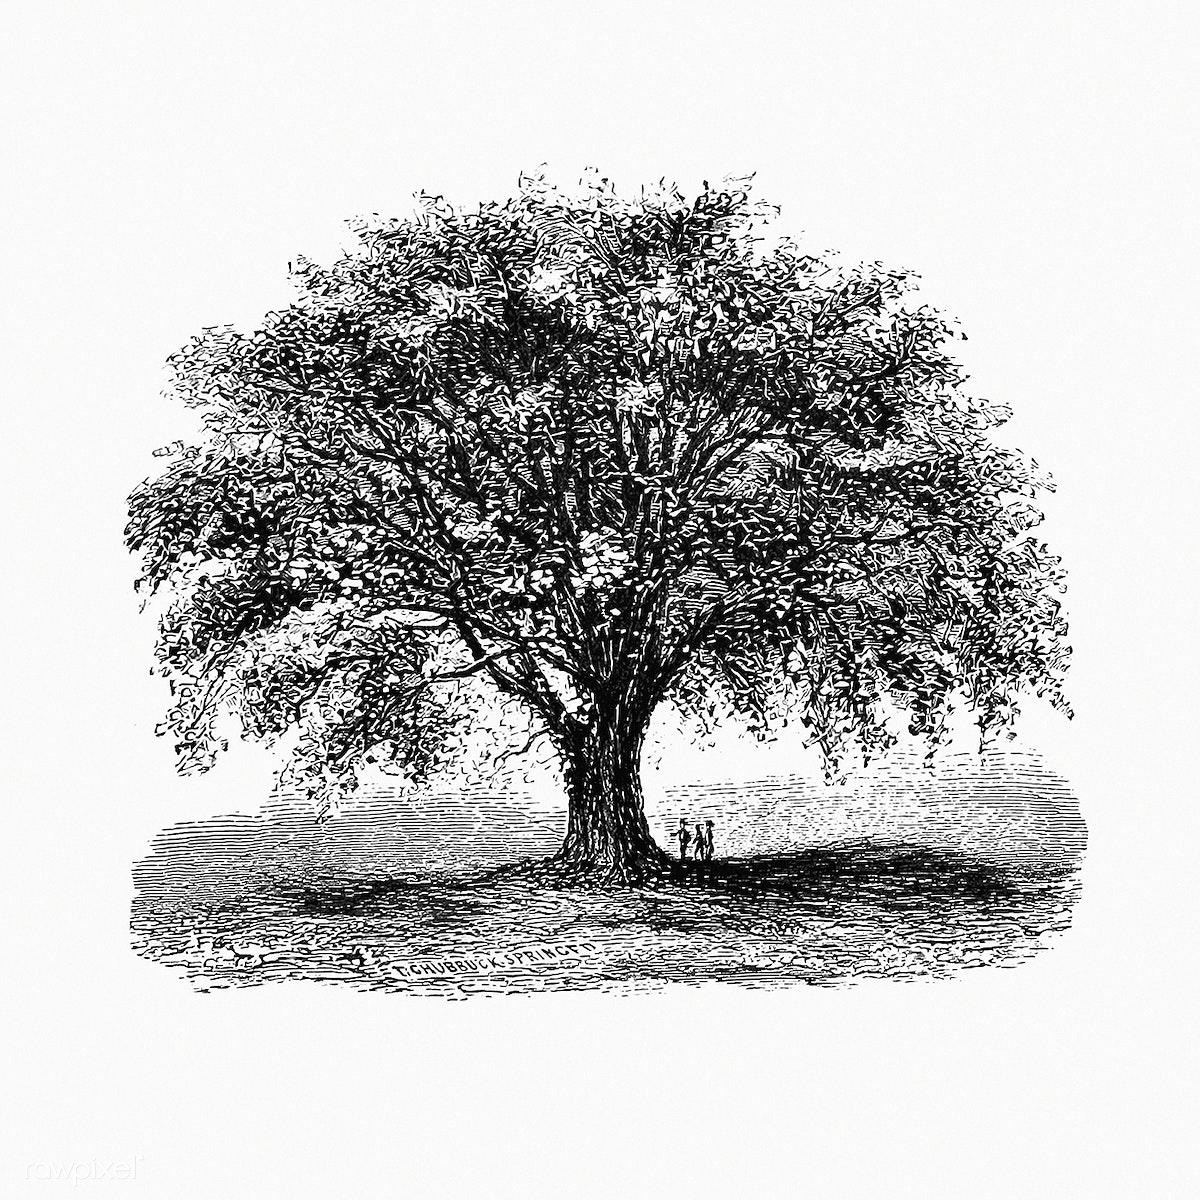 Vintage tree illustration | Free public domain illustration